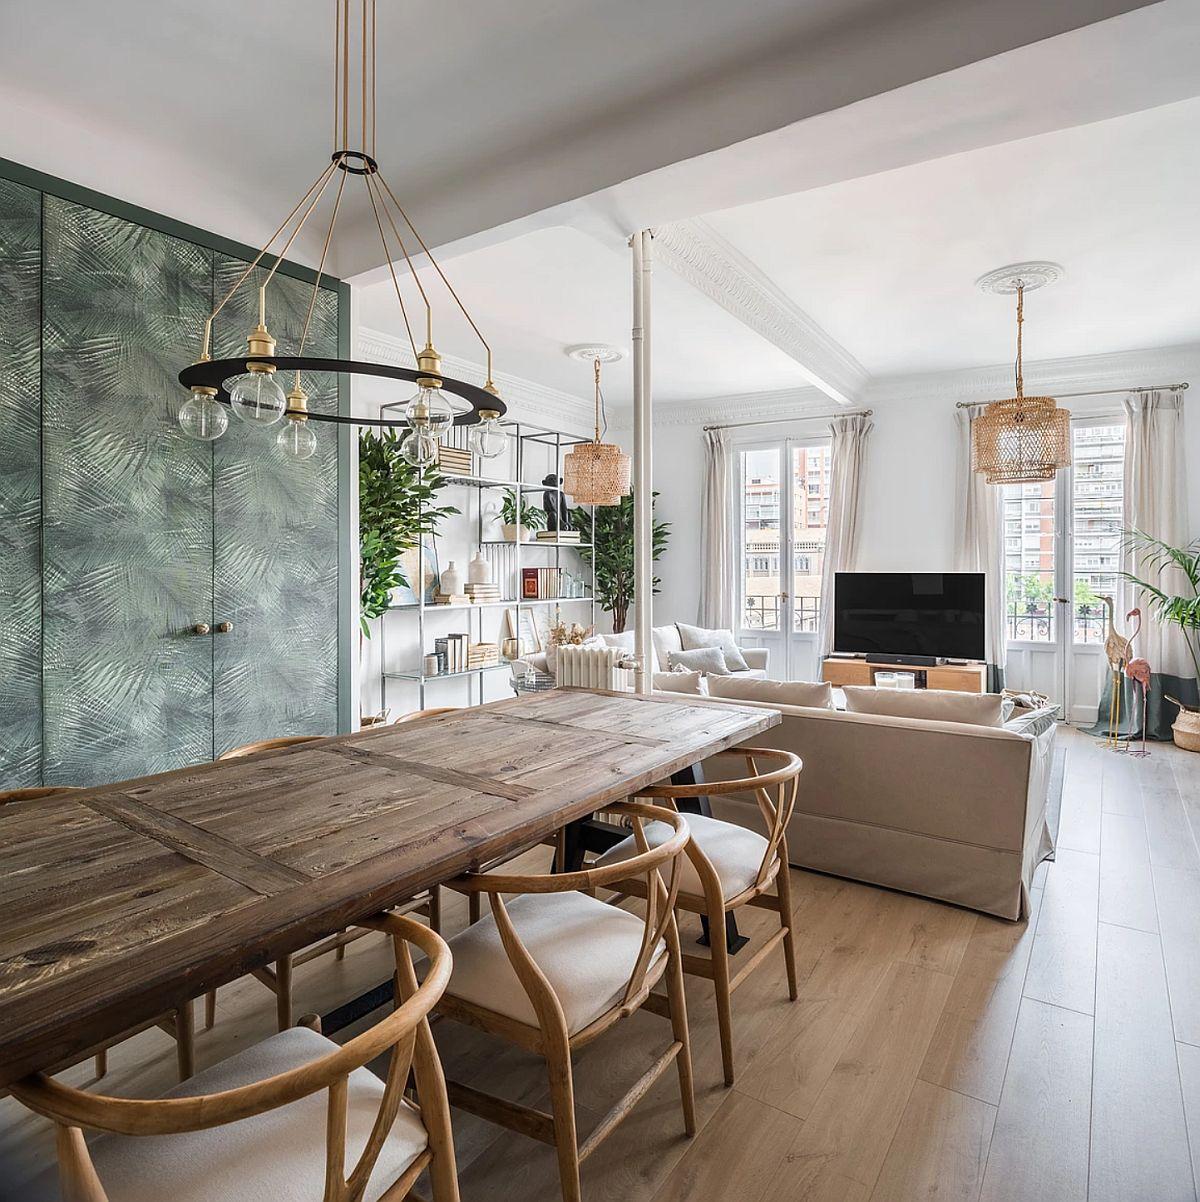 adelaparvu.com despre amenajare apartament in stil urban jungle, design Hoc Volo, Foto Javier Bravo si Felipe Schefell (7)